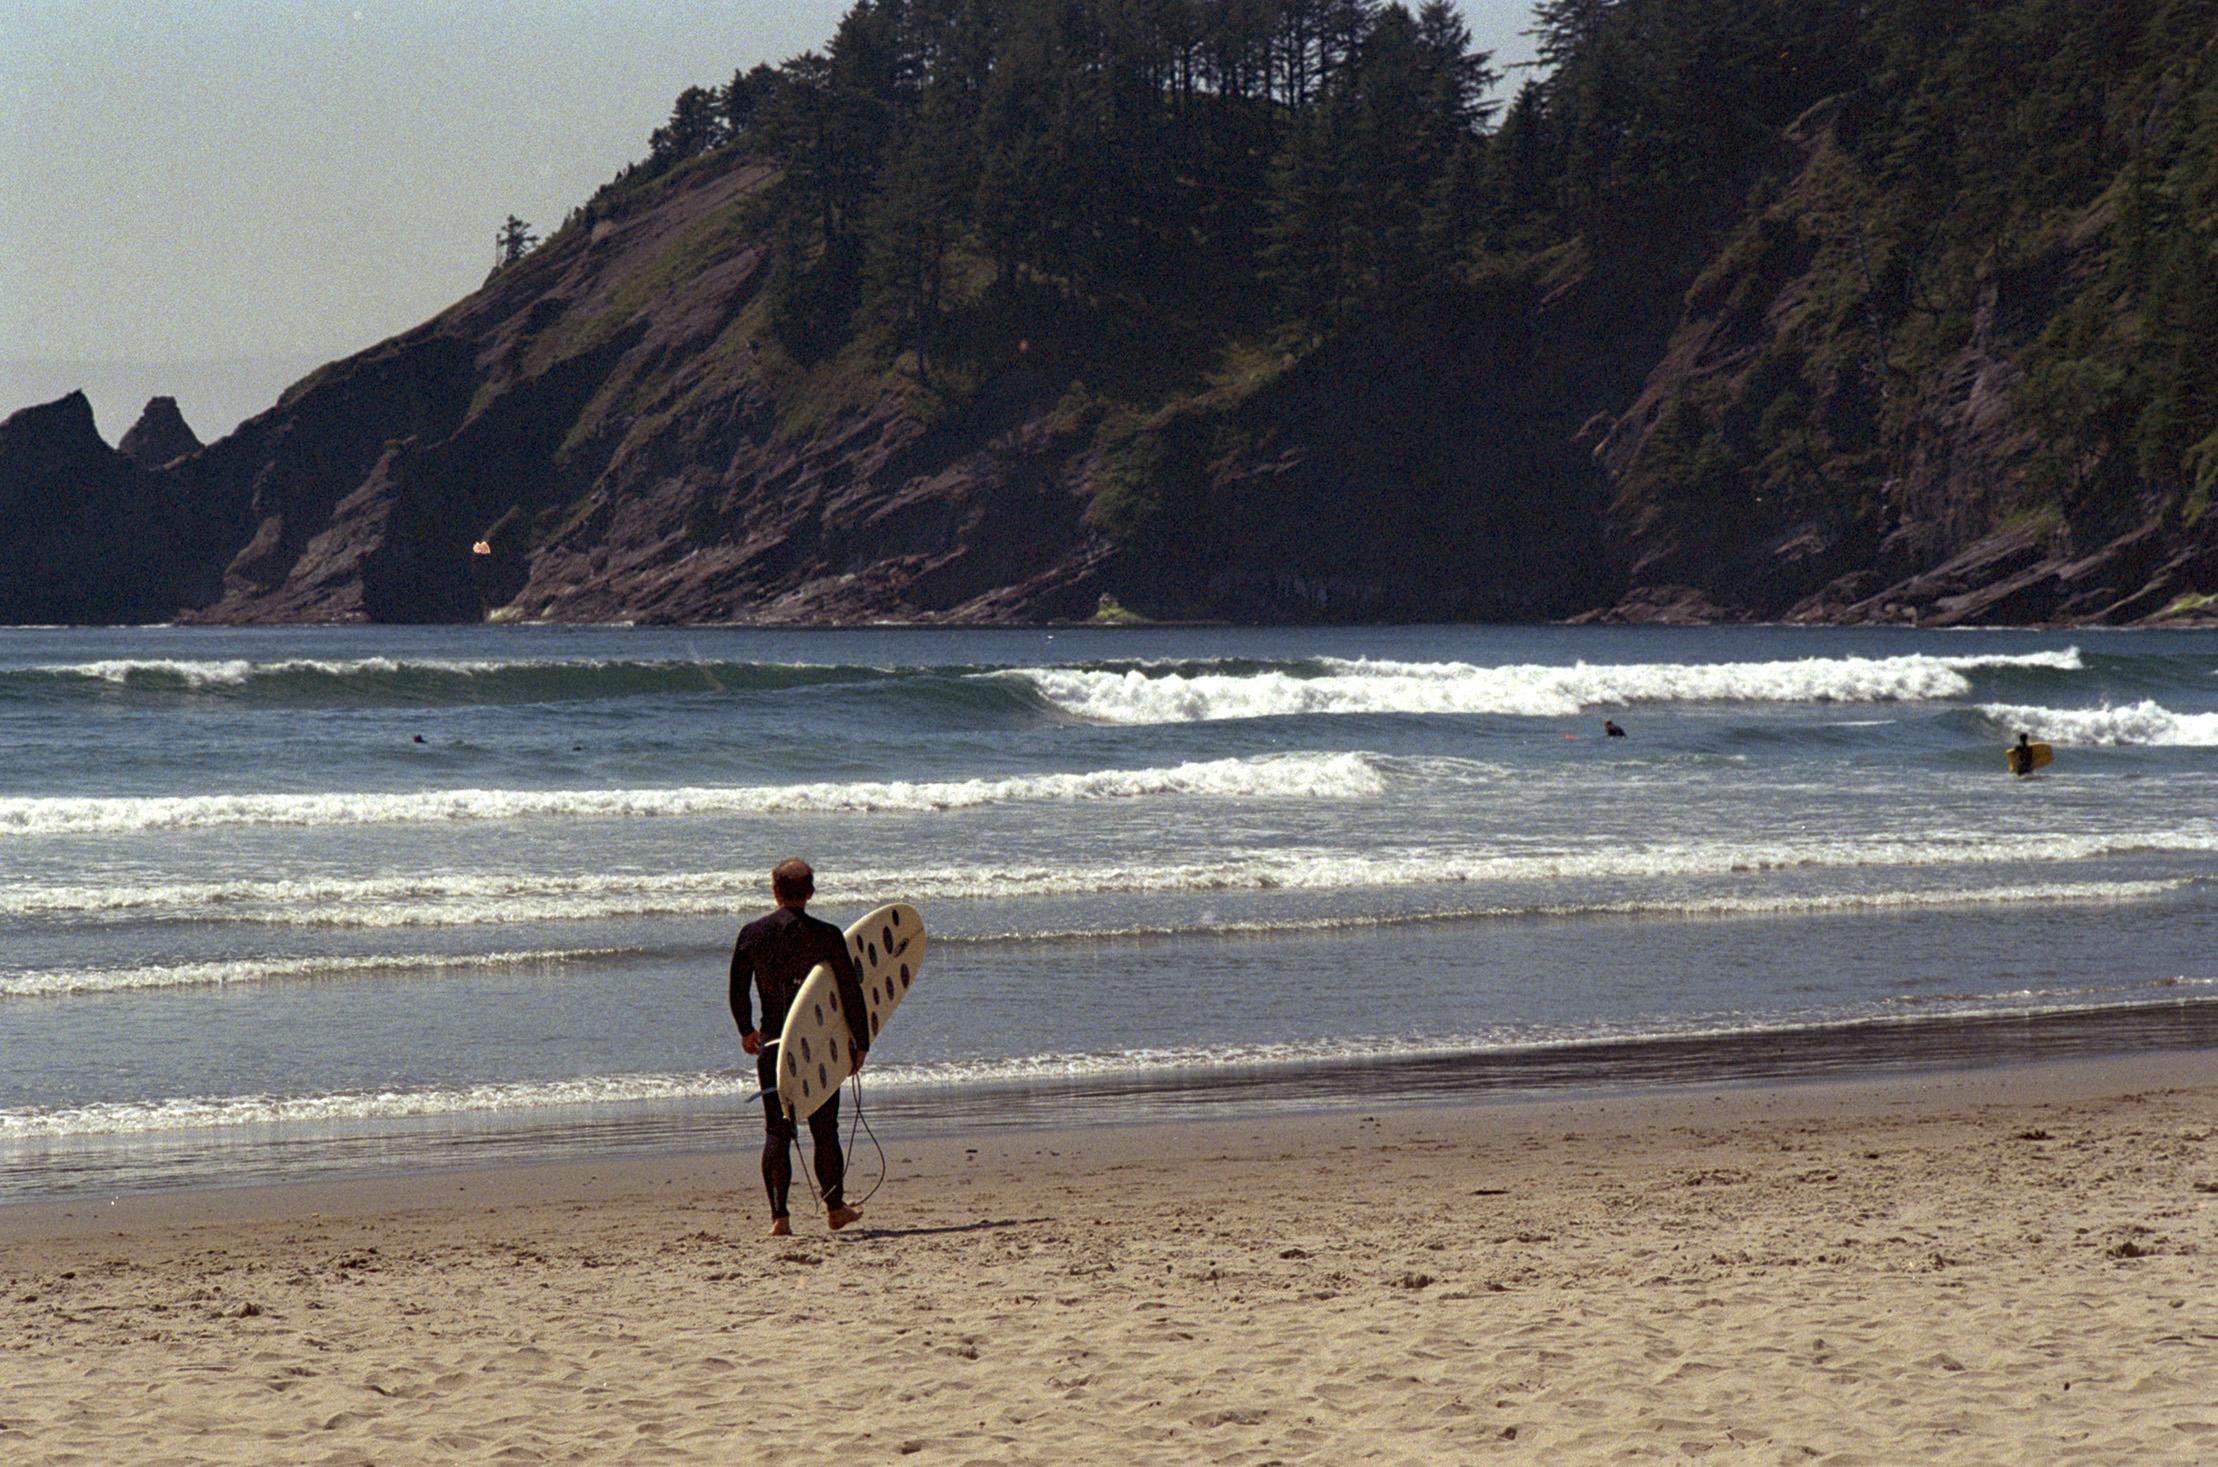 Ryan headed into the surf with the Albino Ladybug surfboard.